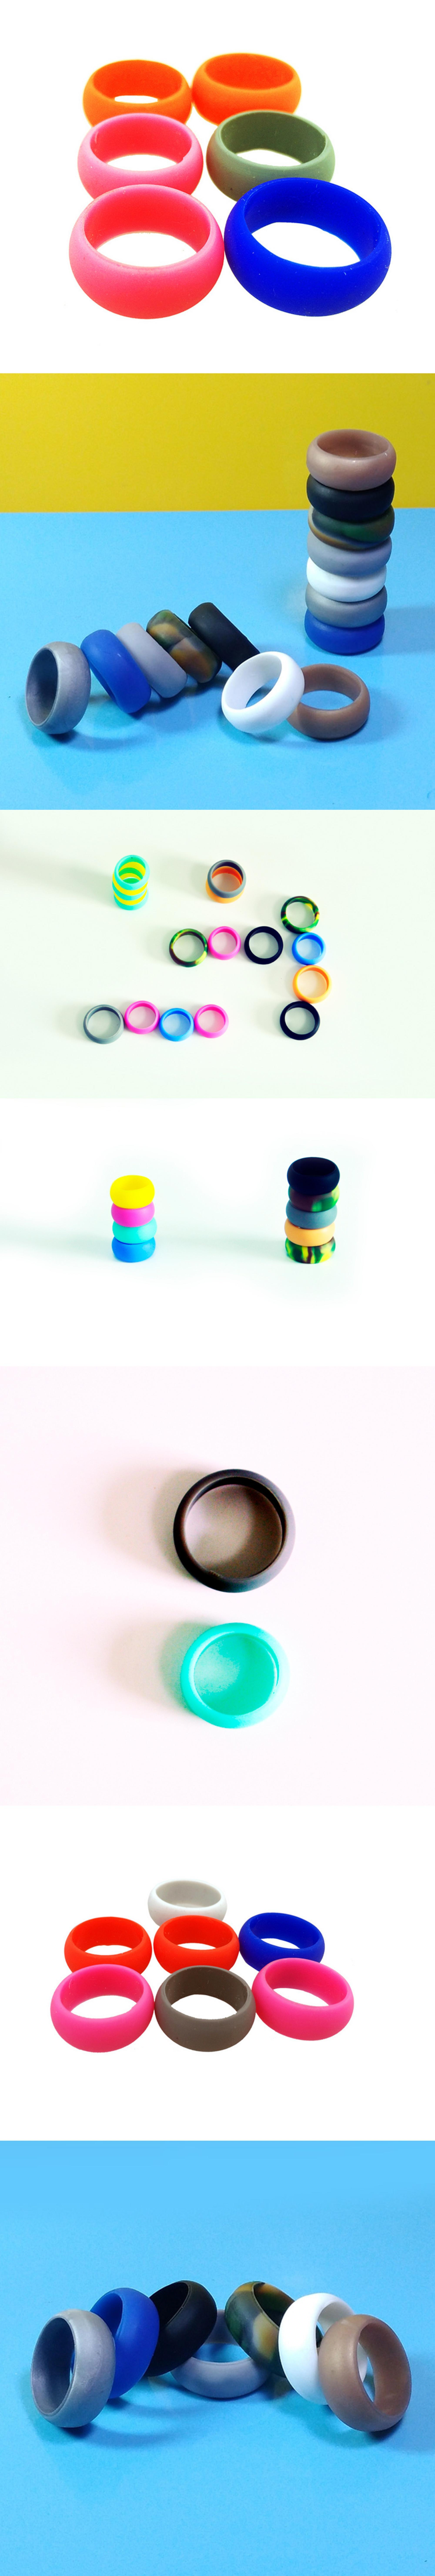 Custom Brand Colorful Soft Fashion Silicone wedding Ring For Sports